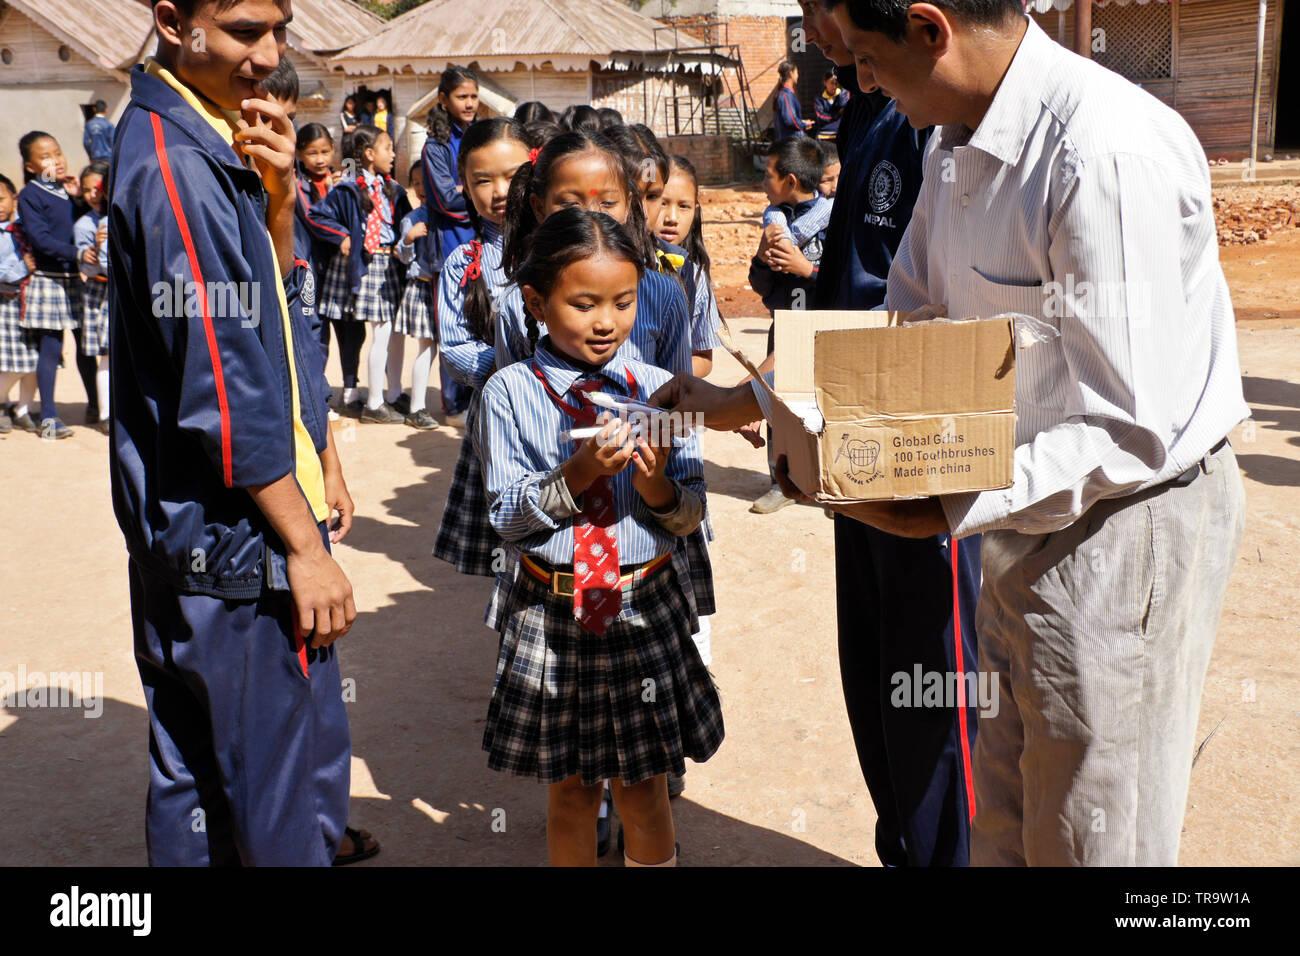 Children in school uniform accepting gift of new toothbrush from Global Grins charity, Samata Bamboo School, Bhaktapur, Kathmandu Valley, Nepal - Stock Image